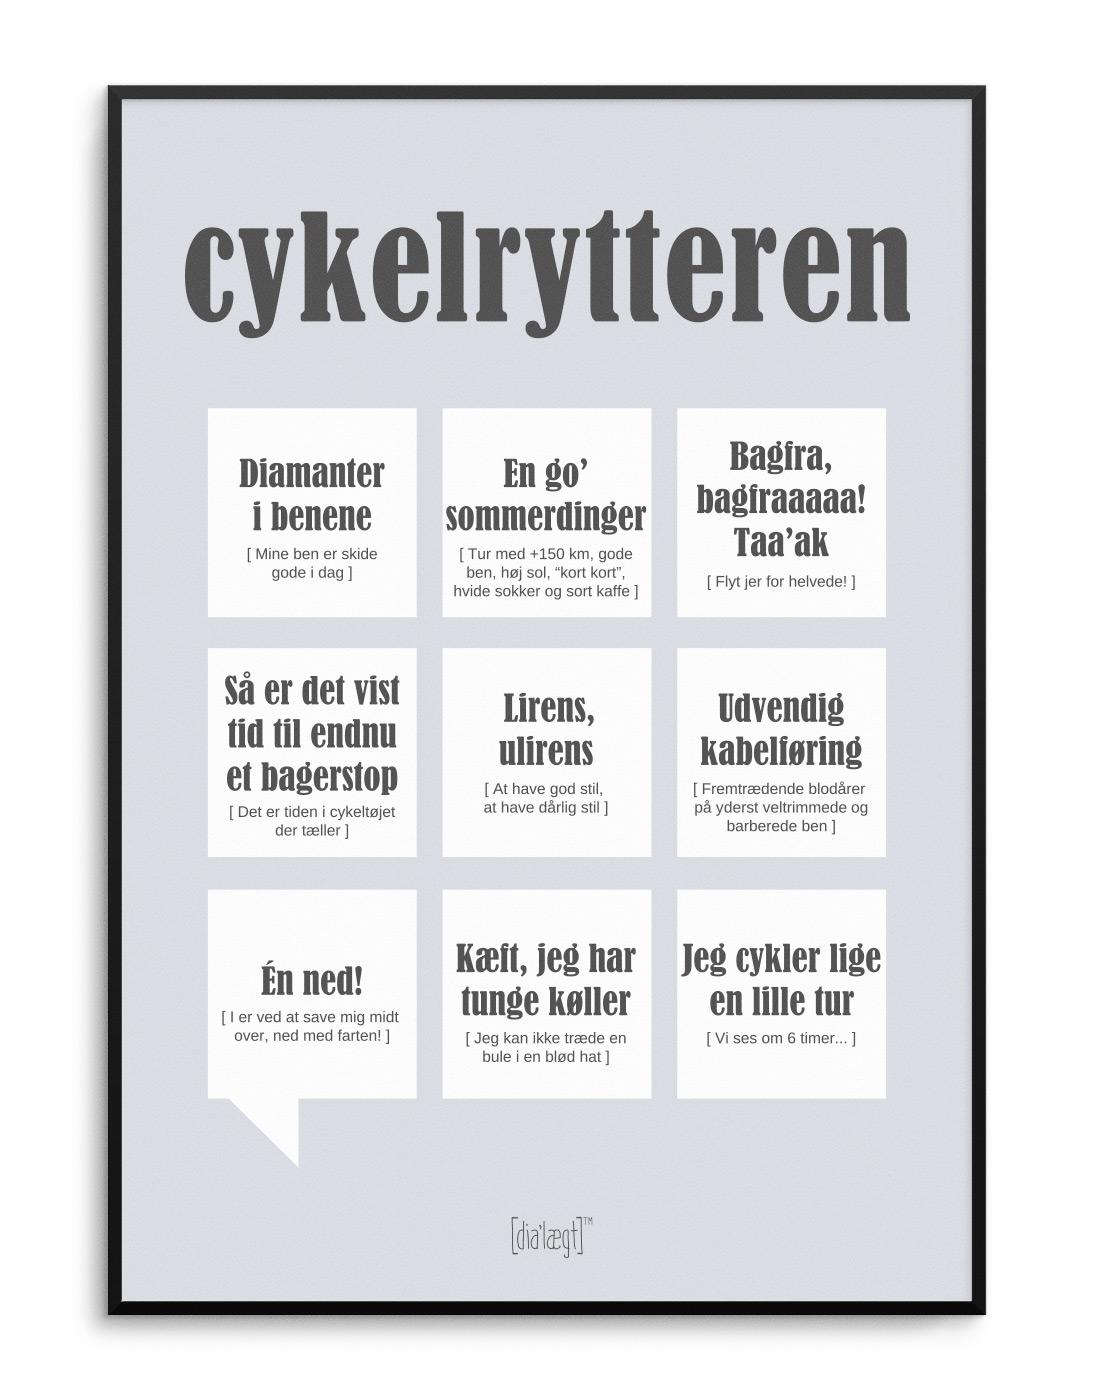 Dialægt Cykelrytteren plakat